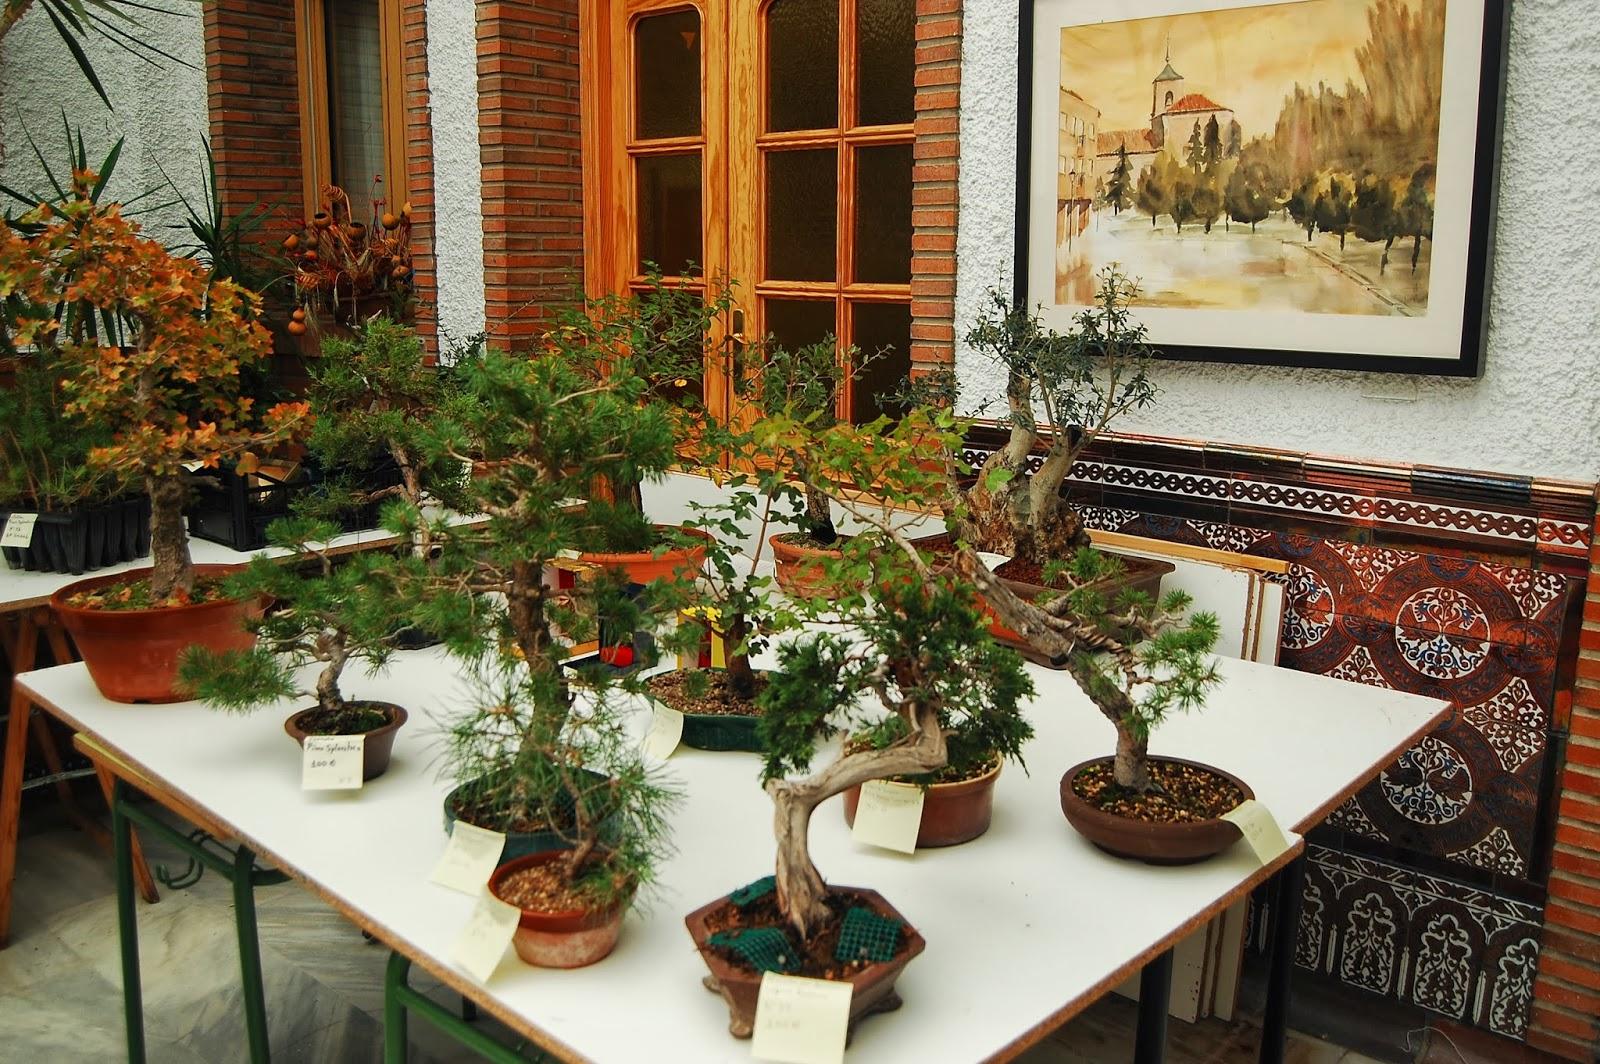 Am bonsai v concurso de prebonsai gri n las fotos el for Vivero grinon